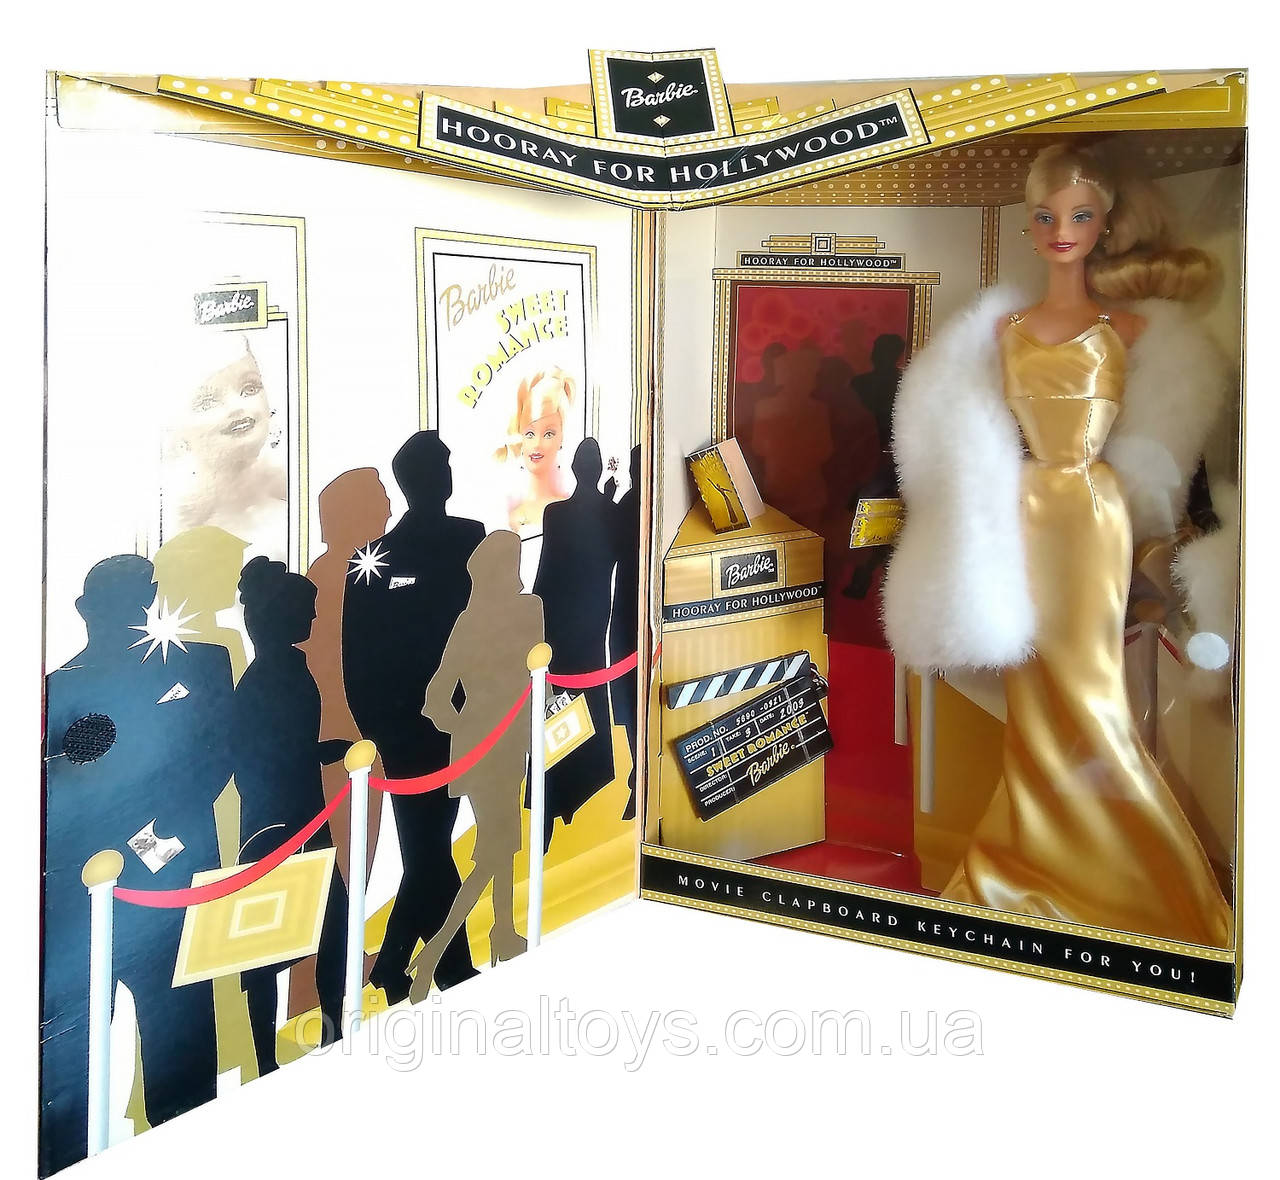 Коллекционная кукла Барби Ура Голливуду Barbie Hooray for Hollywood 2002 Mattel 56901